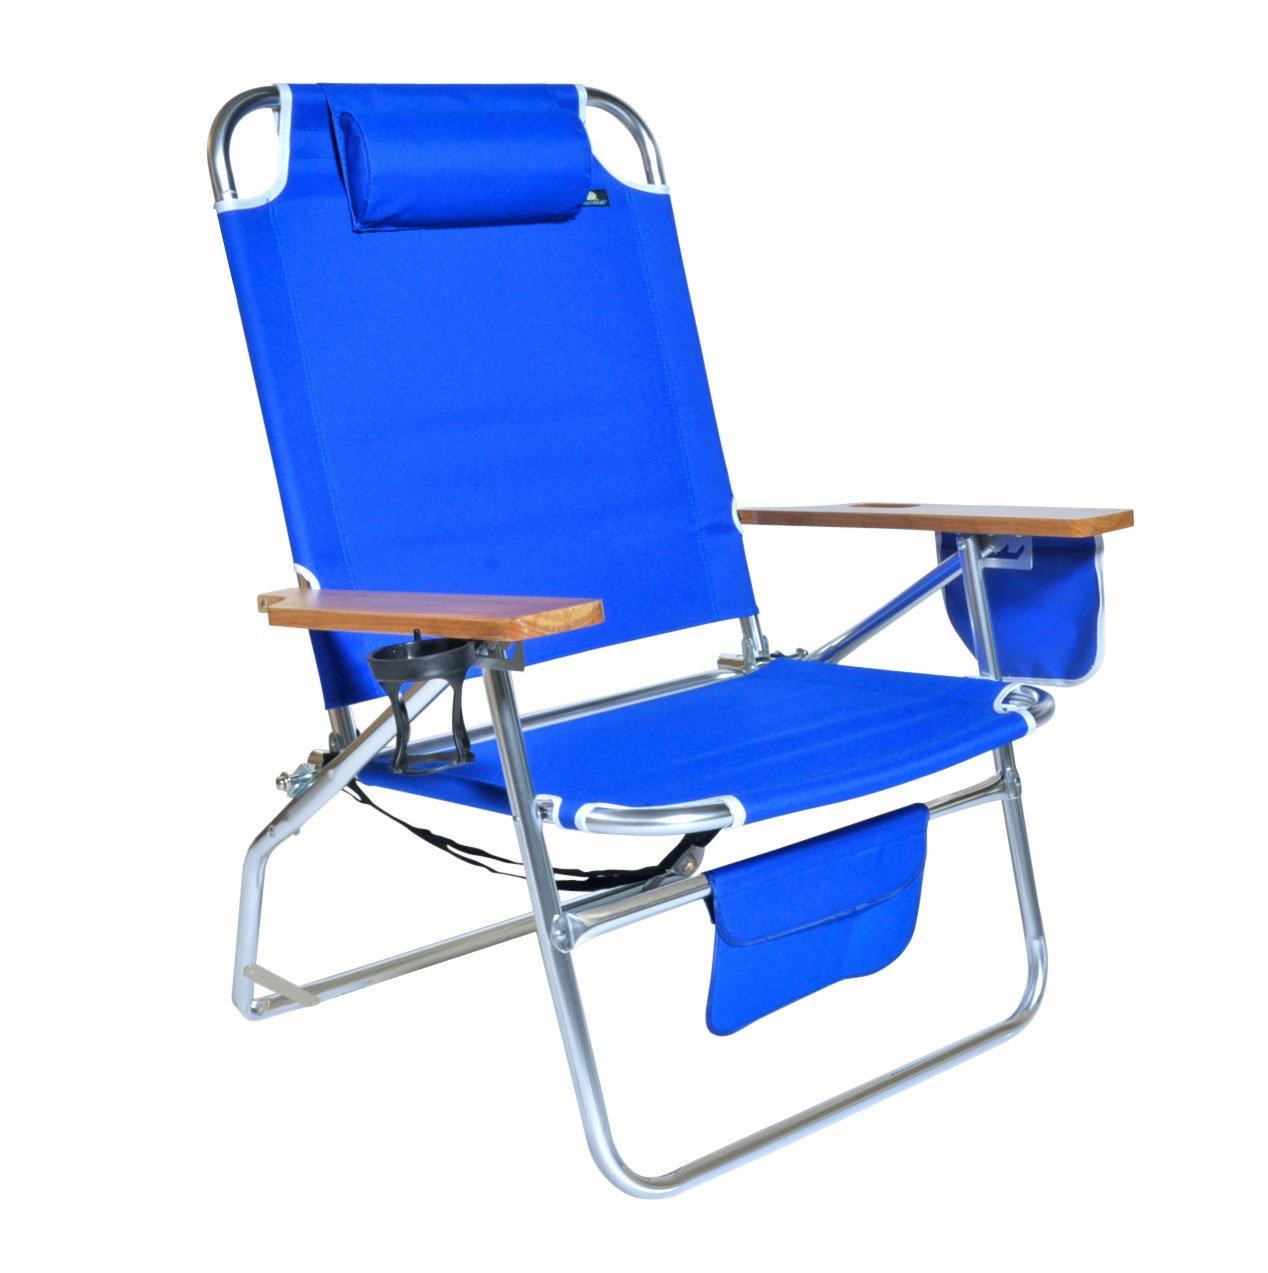 BigジャンボHeavy Duty 500 lbs XLアルミビーチ椅子for Big & Tall B0027R2ZWU  ブルー